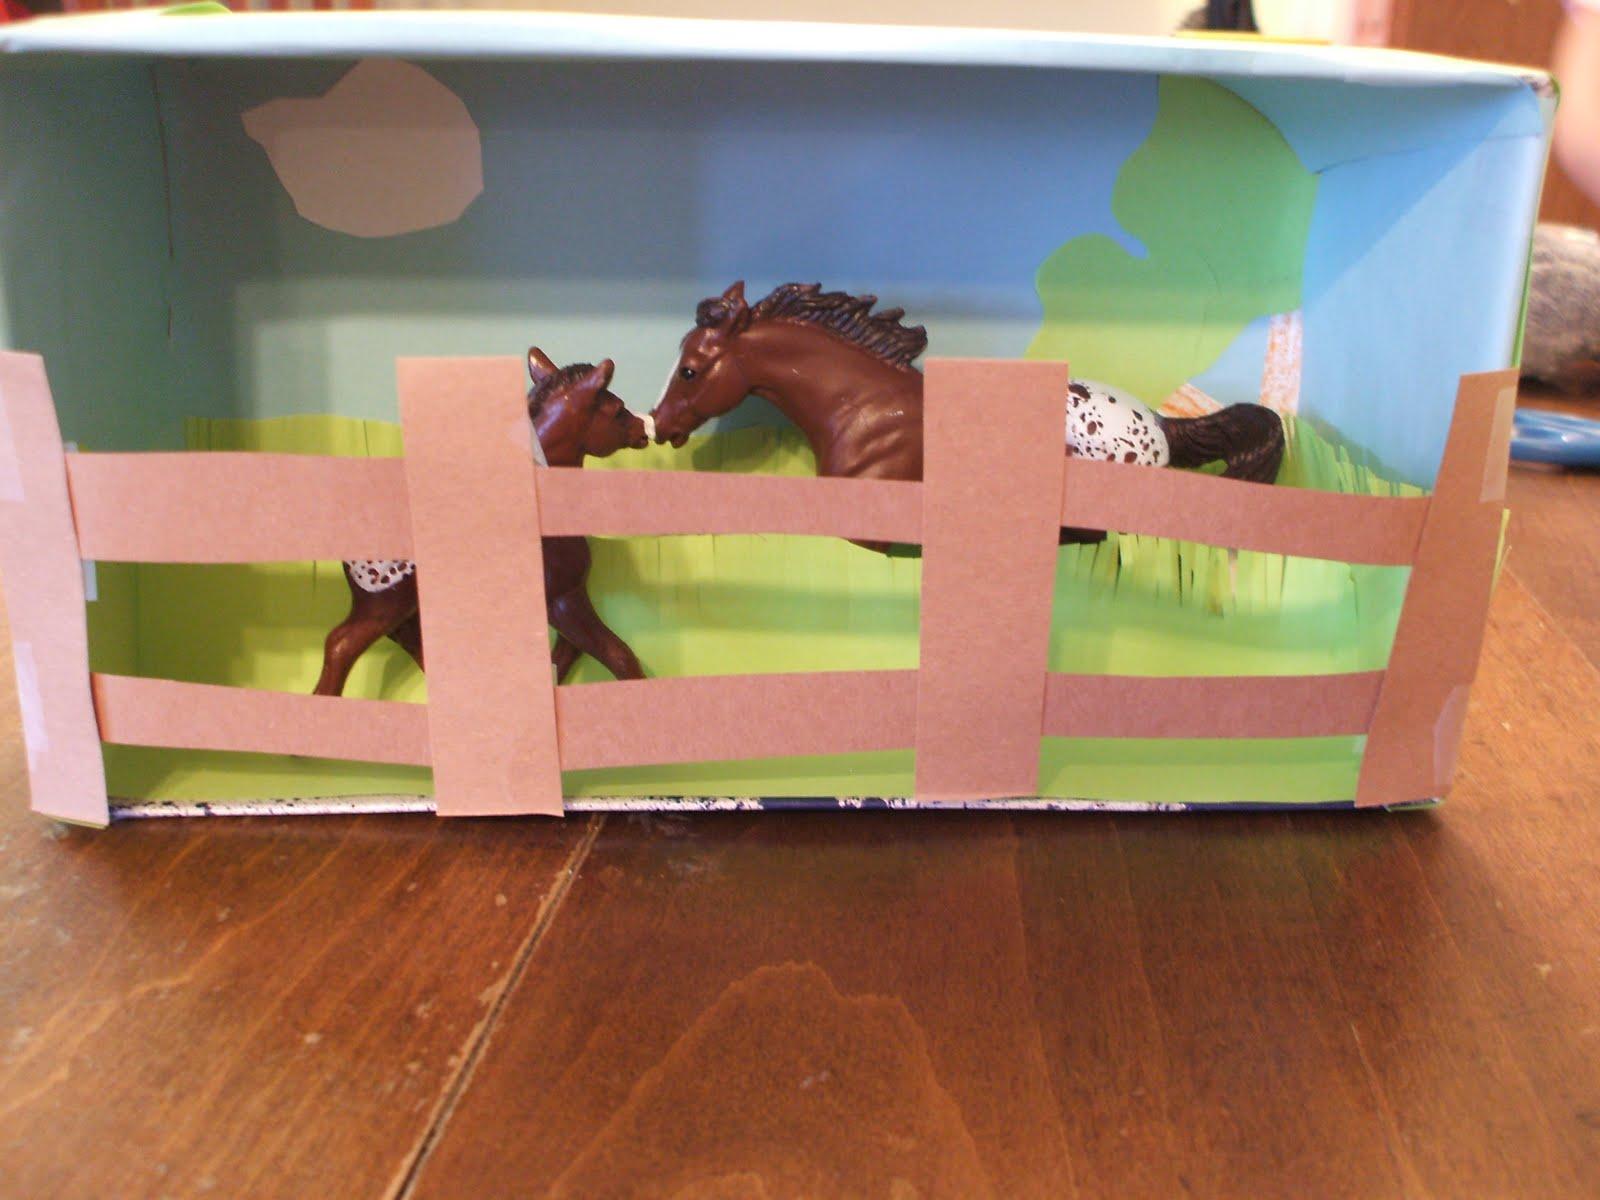 Woodwork Plane: 4 H Horse Project Ideas Wooden Plans